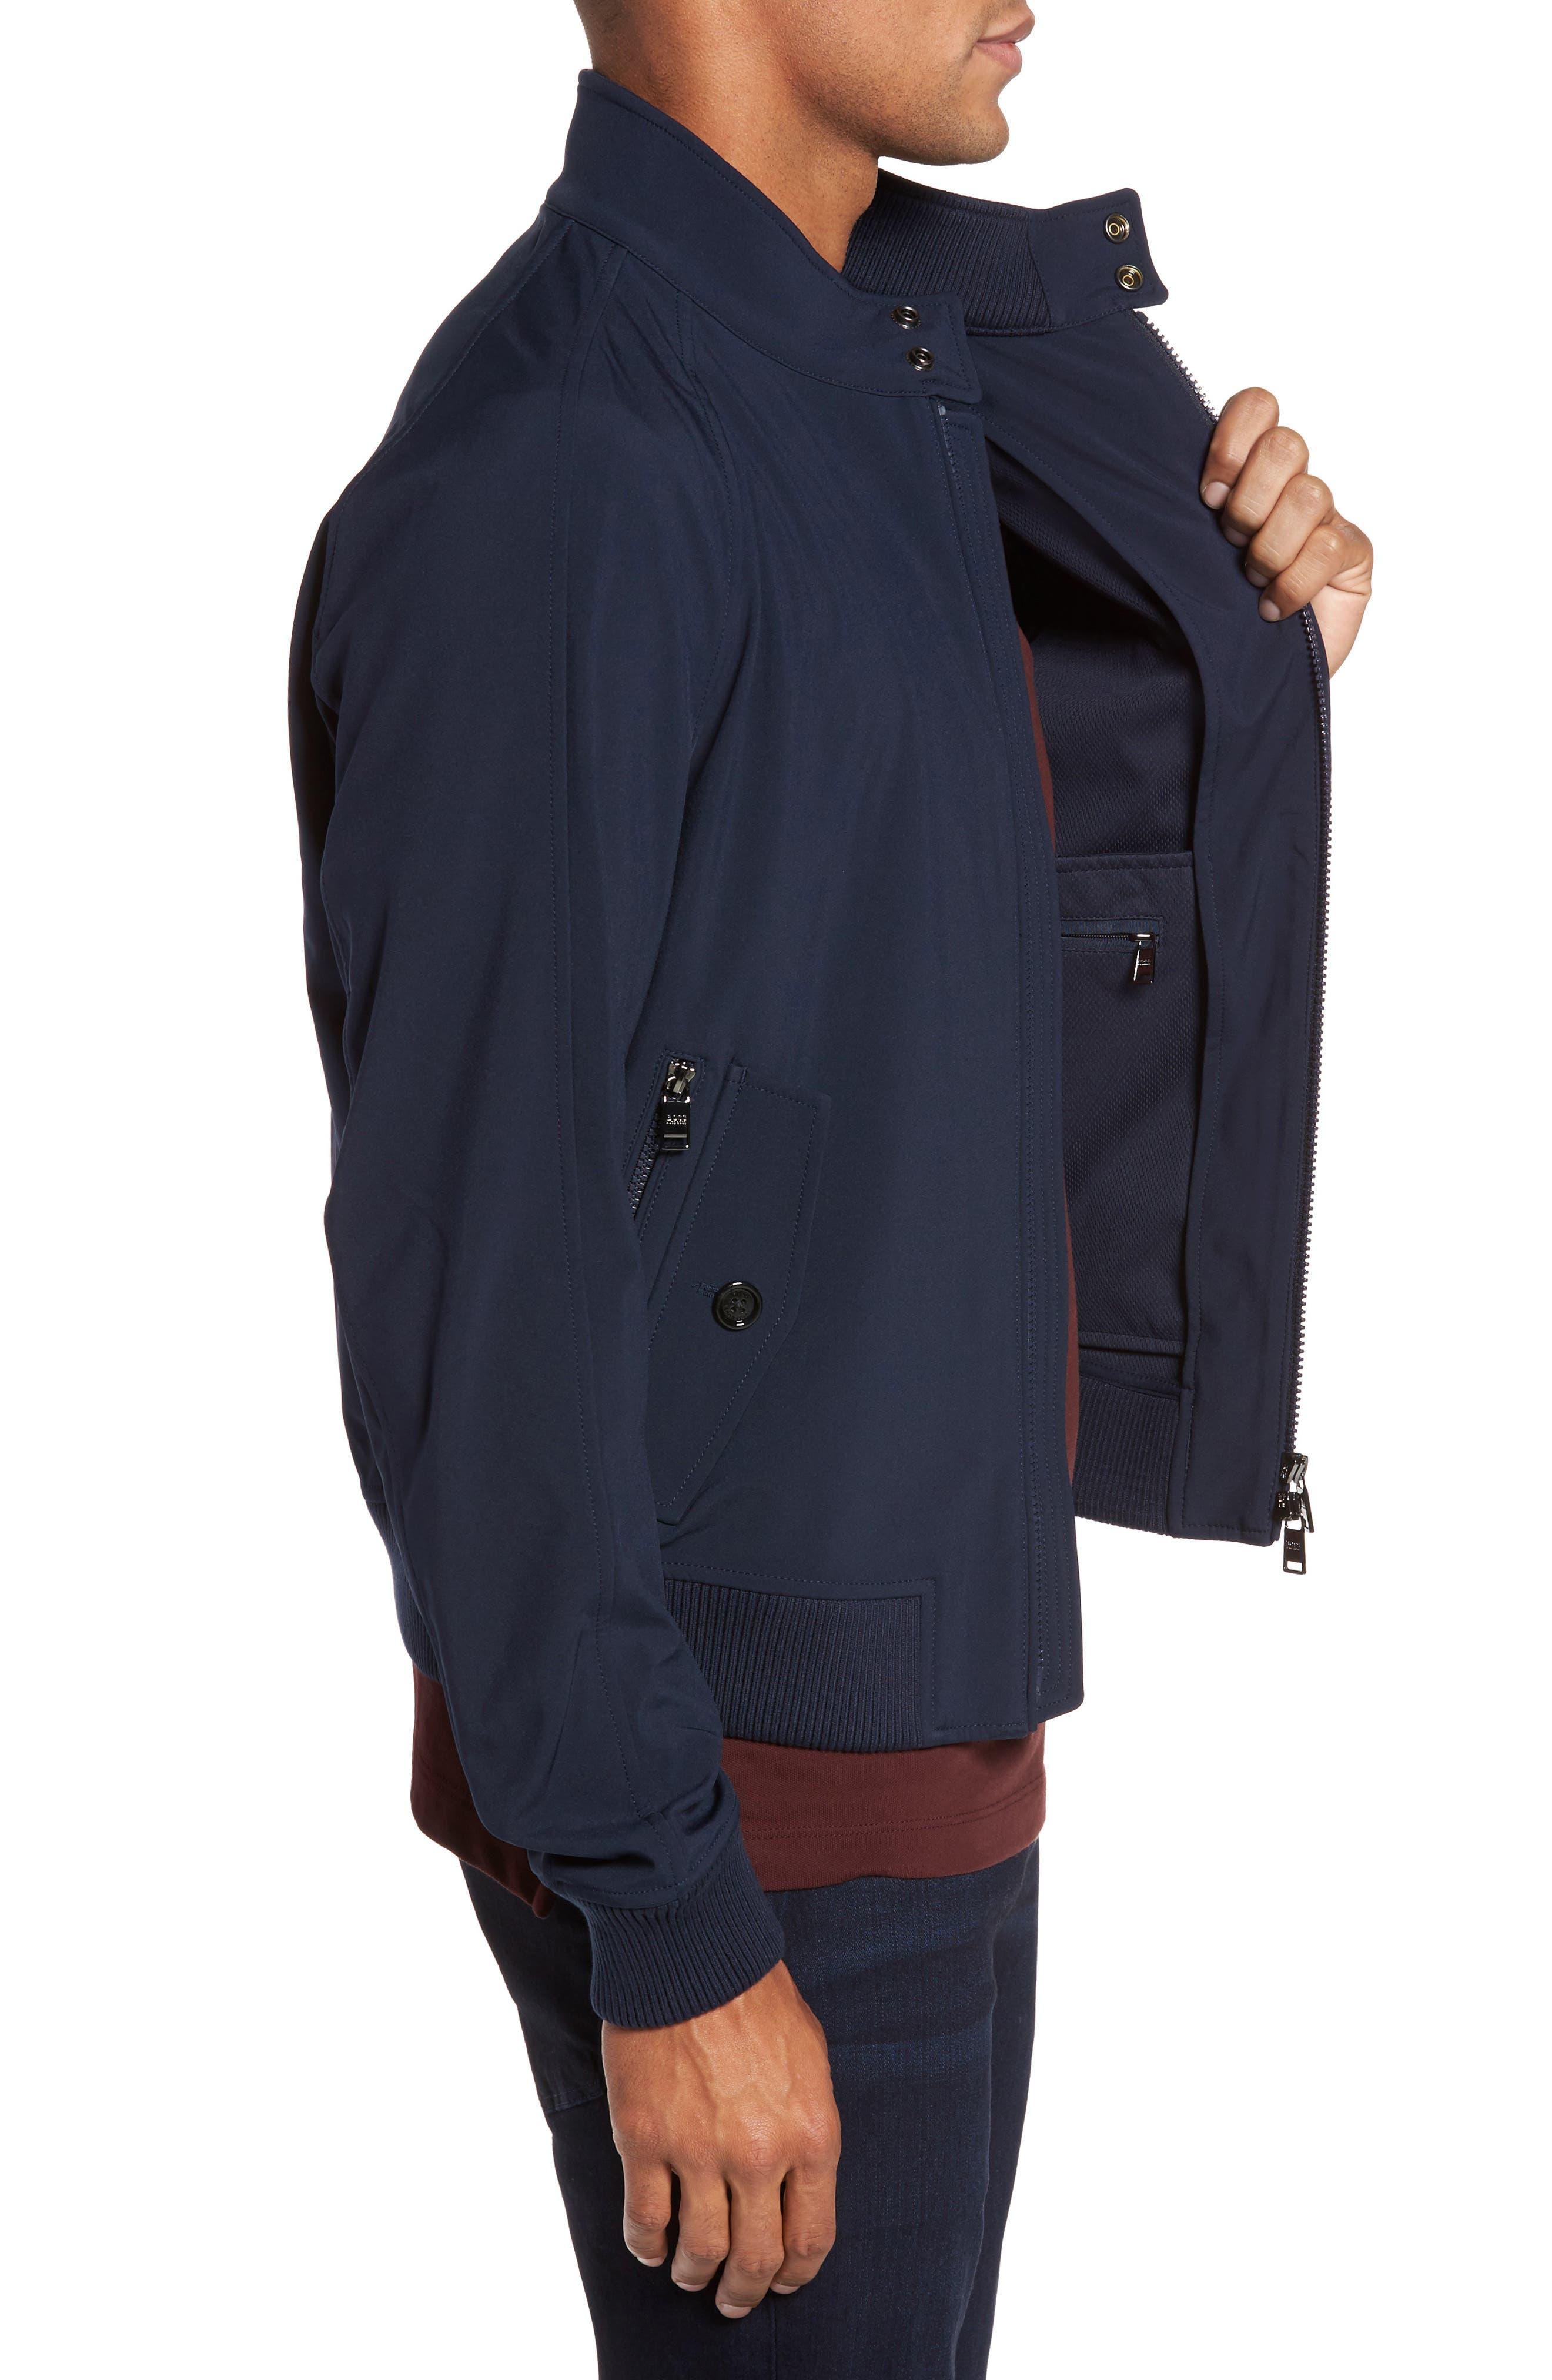 Corva Technical Jacket,                             Alternate thumbnail 3, color,                             410